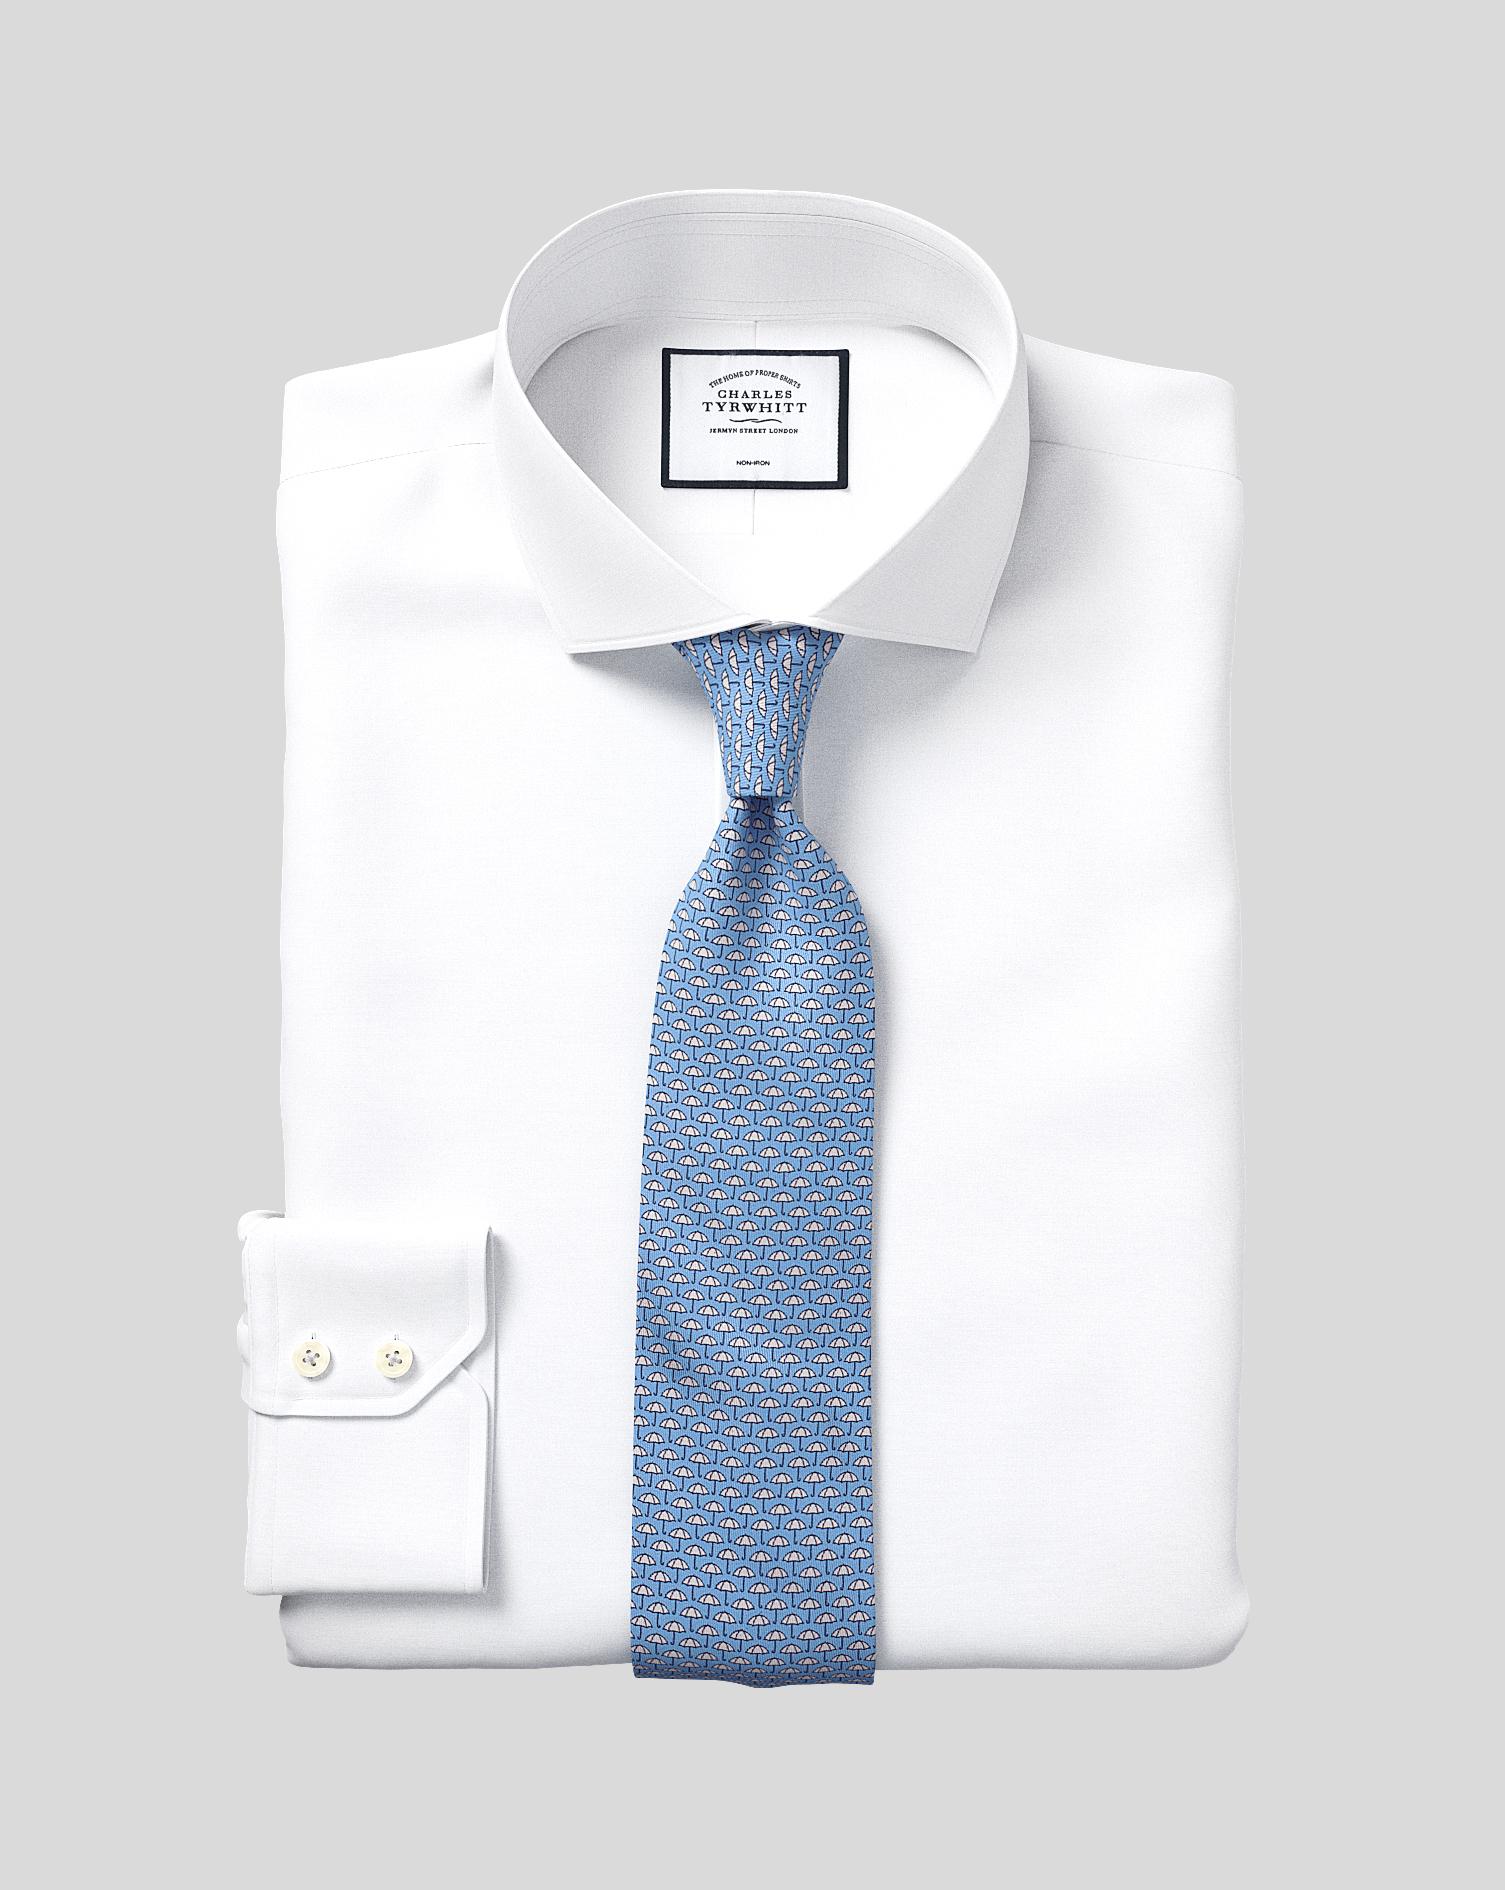 Classic Fit Non-Iron Cutaway White Tyrwhitt Cool Cotton Formal Shirt Single Cuff Size 17/35 by Charl